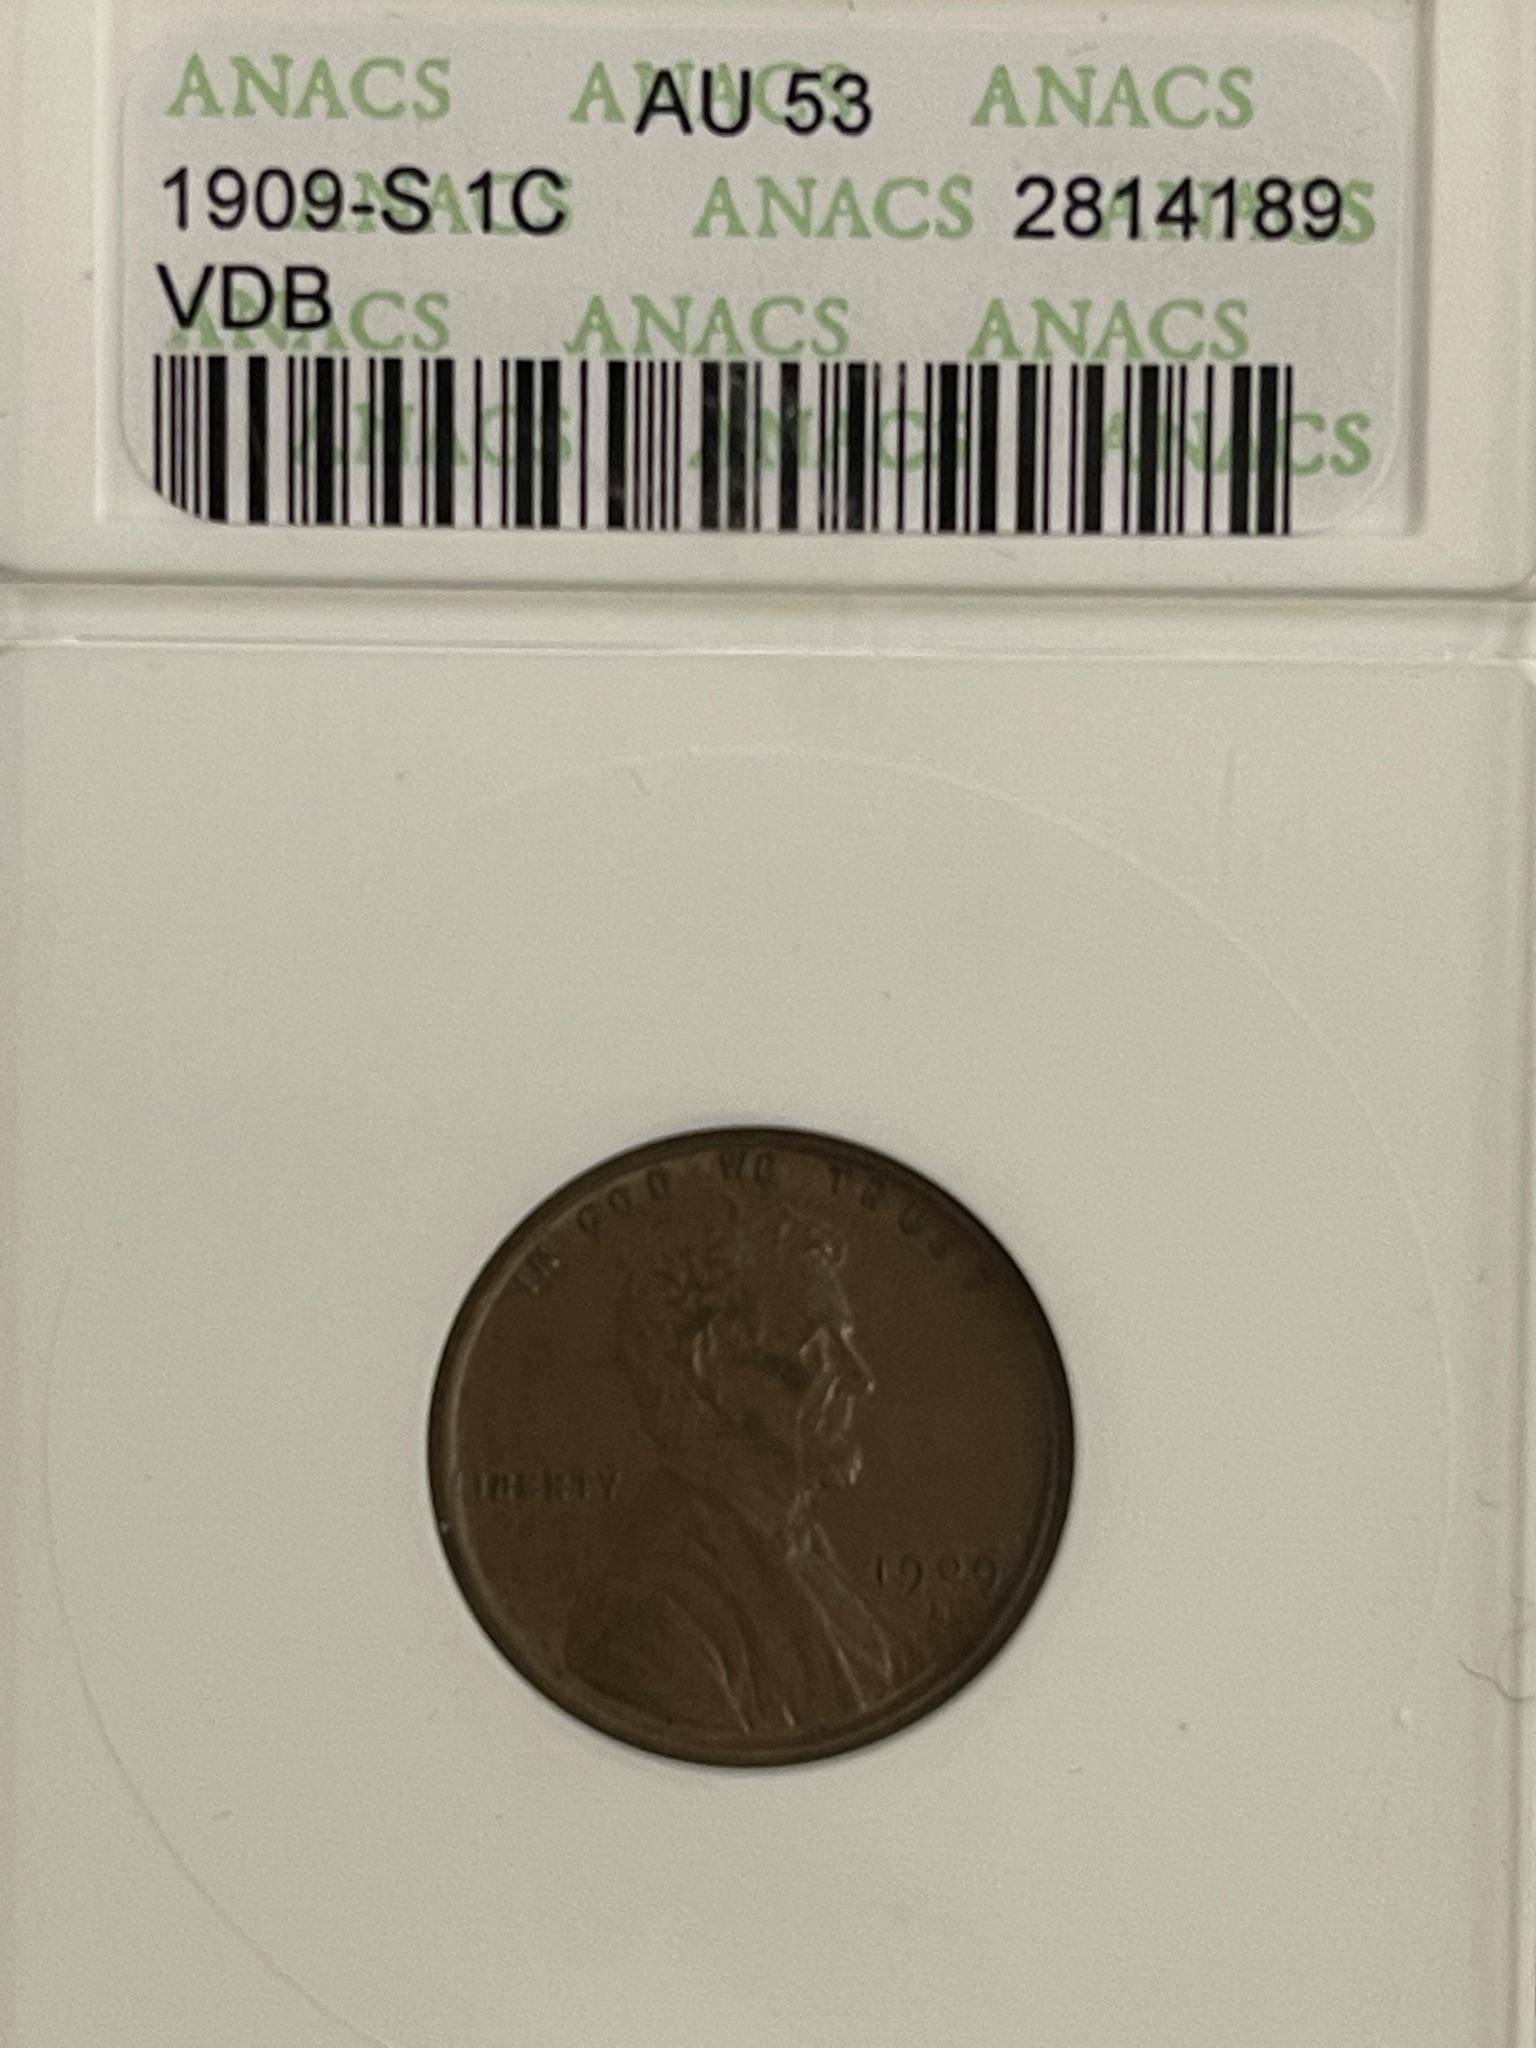 Rare 1909-S VDB Penny Graded AU 53